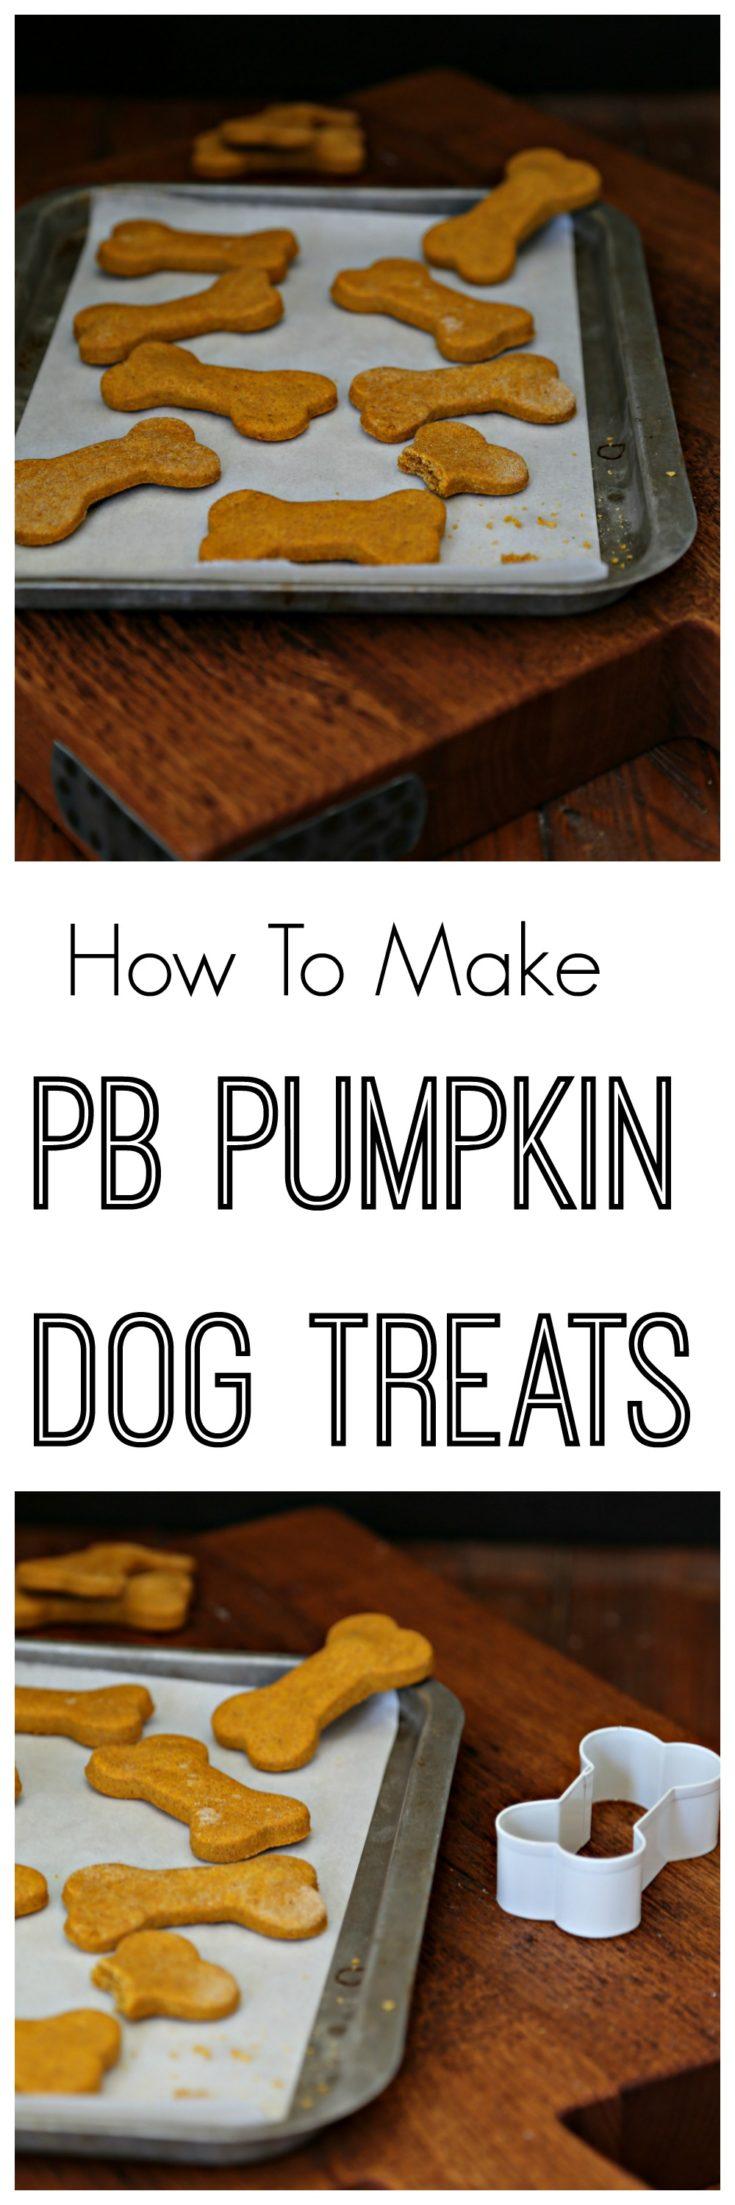 Your dogs will love these homemade peanut butter and pumpkin dog treats. #dogs #dogtreats #peanutbutter #pumpkin #dogbones